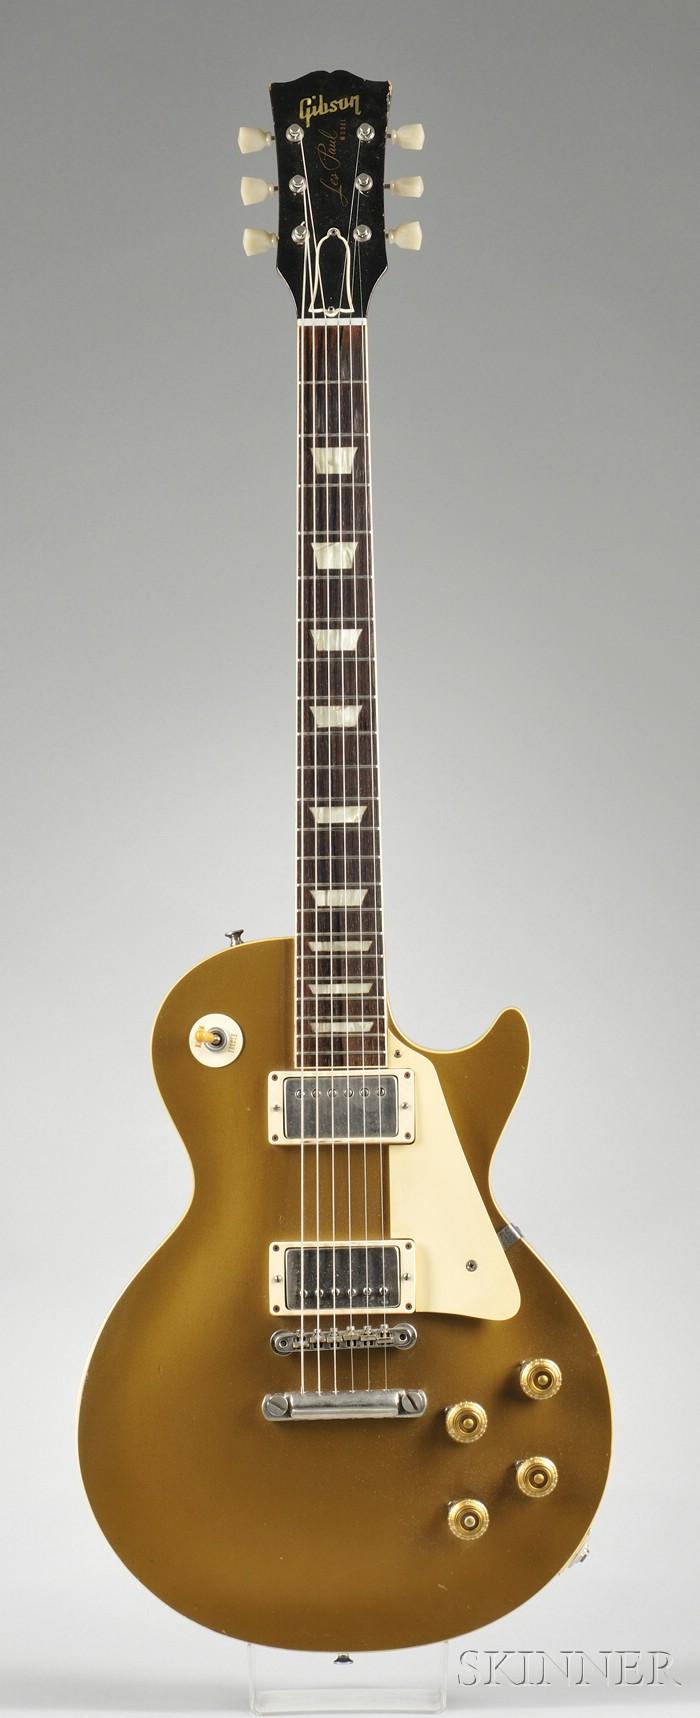 American Guitar, Gibson Incorporated, Kalamazoo, 1957, Model Les Paul